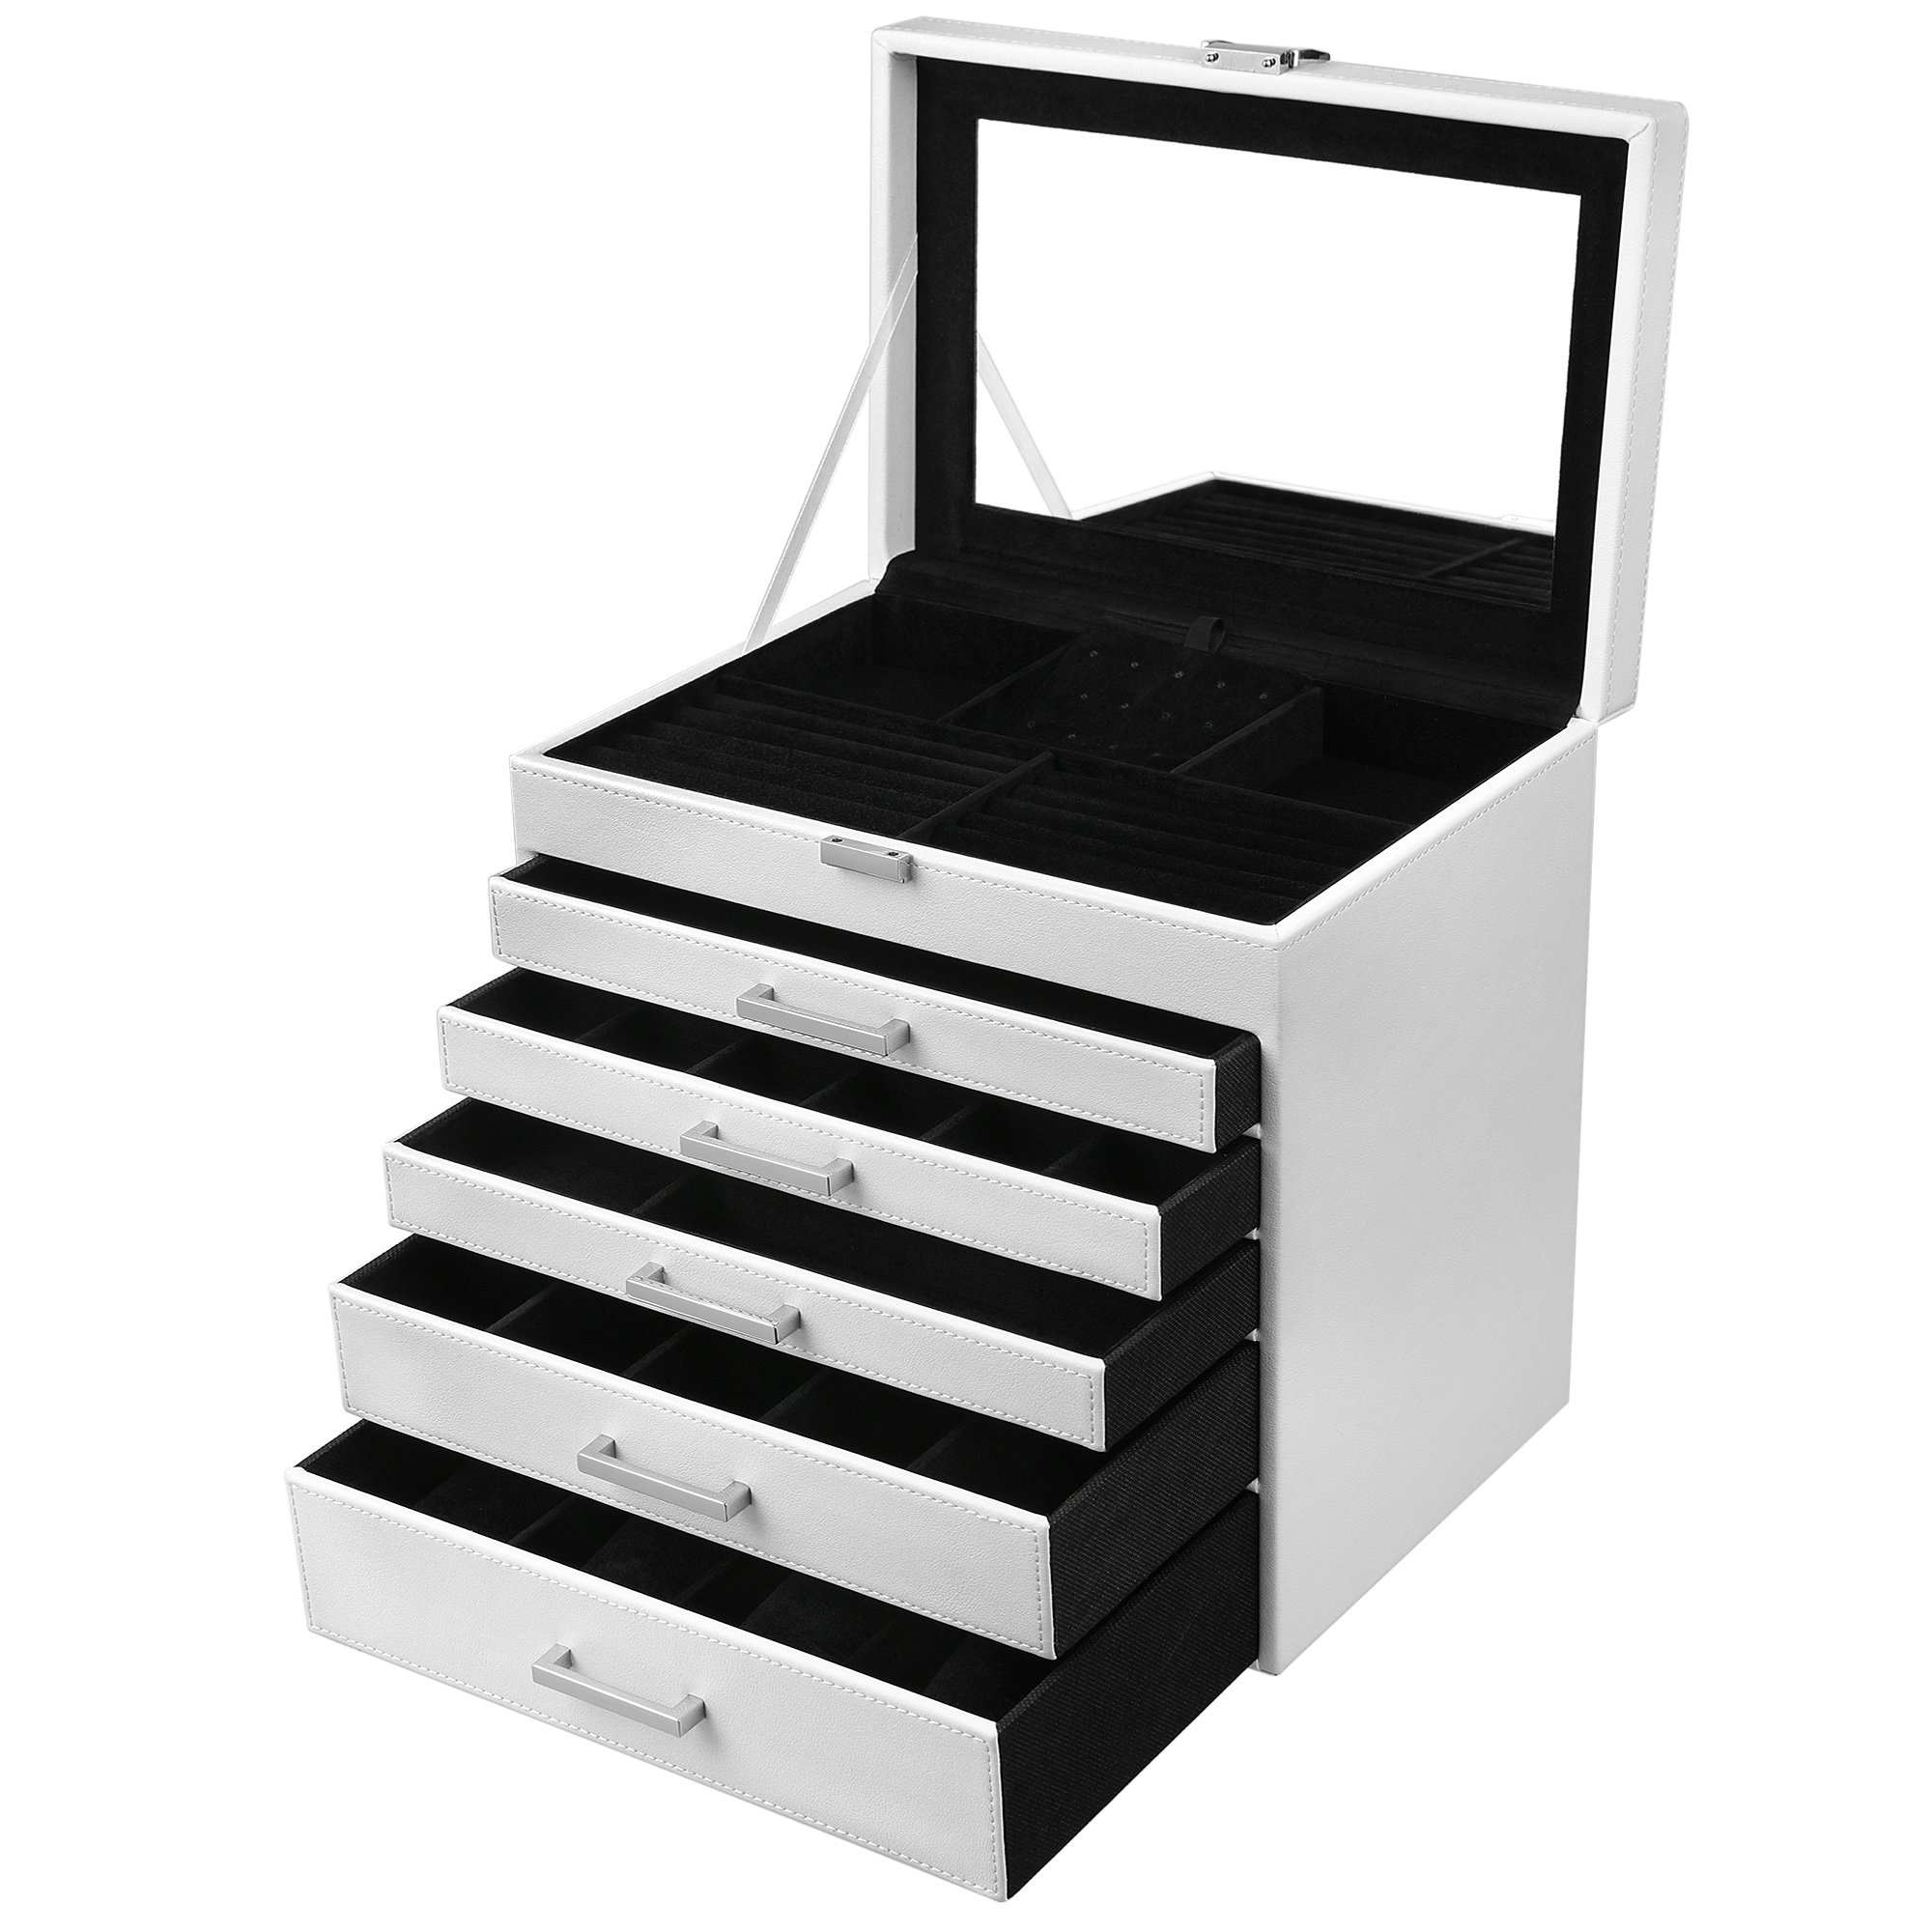 SONGMICS 6LayersJewelryOrganizer,Extra LargeBox Mirrored StorageCase, Sunglasses Watches Holder, WhiteUJBC160